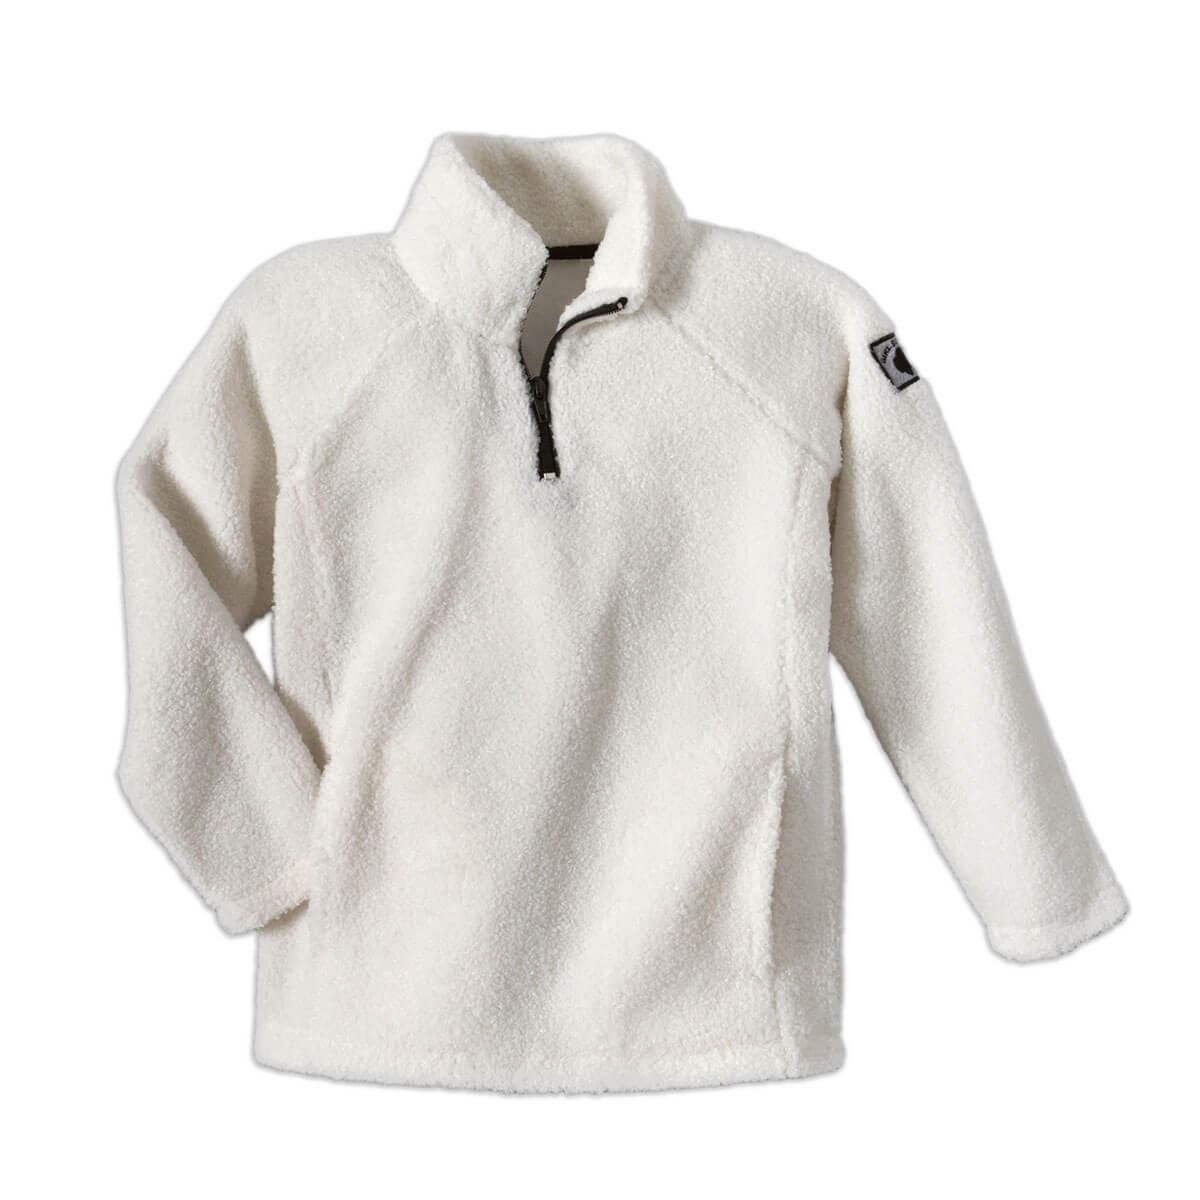 Poodle Sherpa Jacket